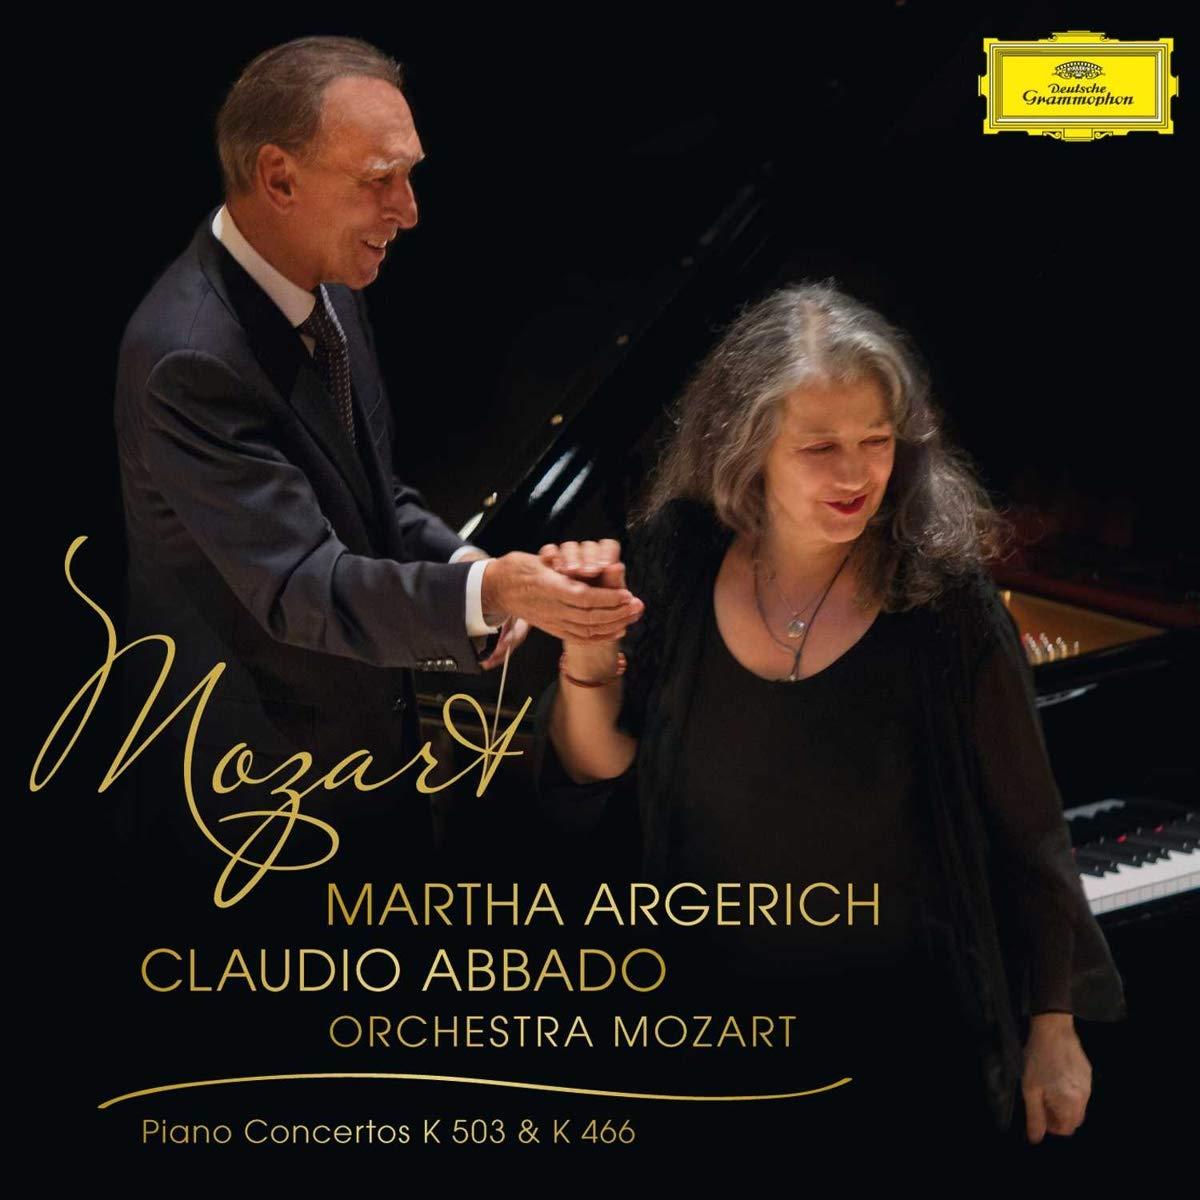 Mozart: Klavierkonzerte 20, KV 466 & 25, KV.503 - Martha Argerich, Wolfgang  Amadeus Mozart, Claudio Abbado, Orchestra Mozart: Amazon.de: Musik